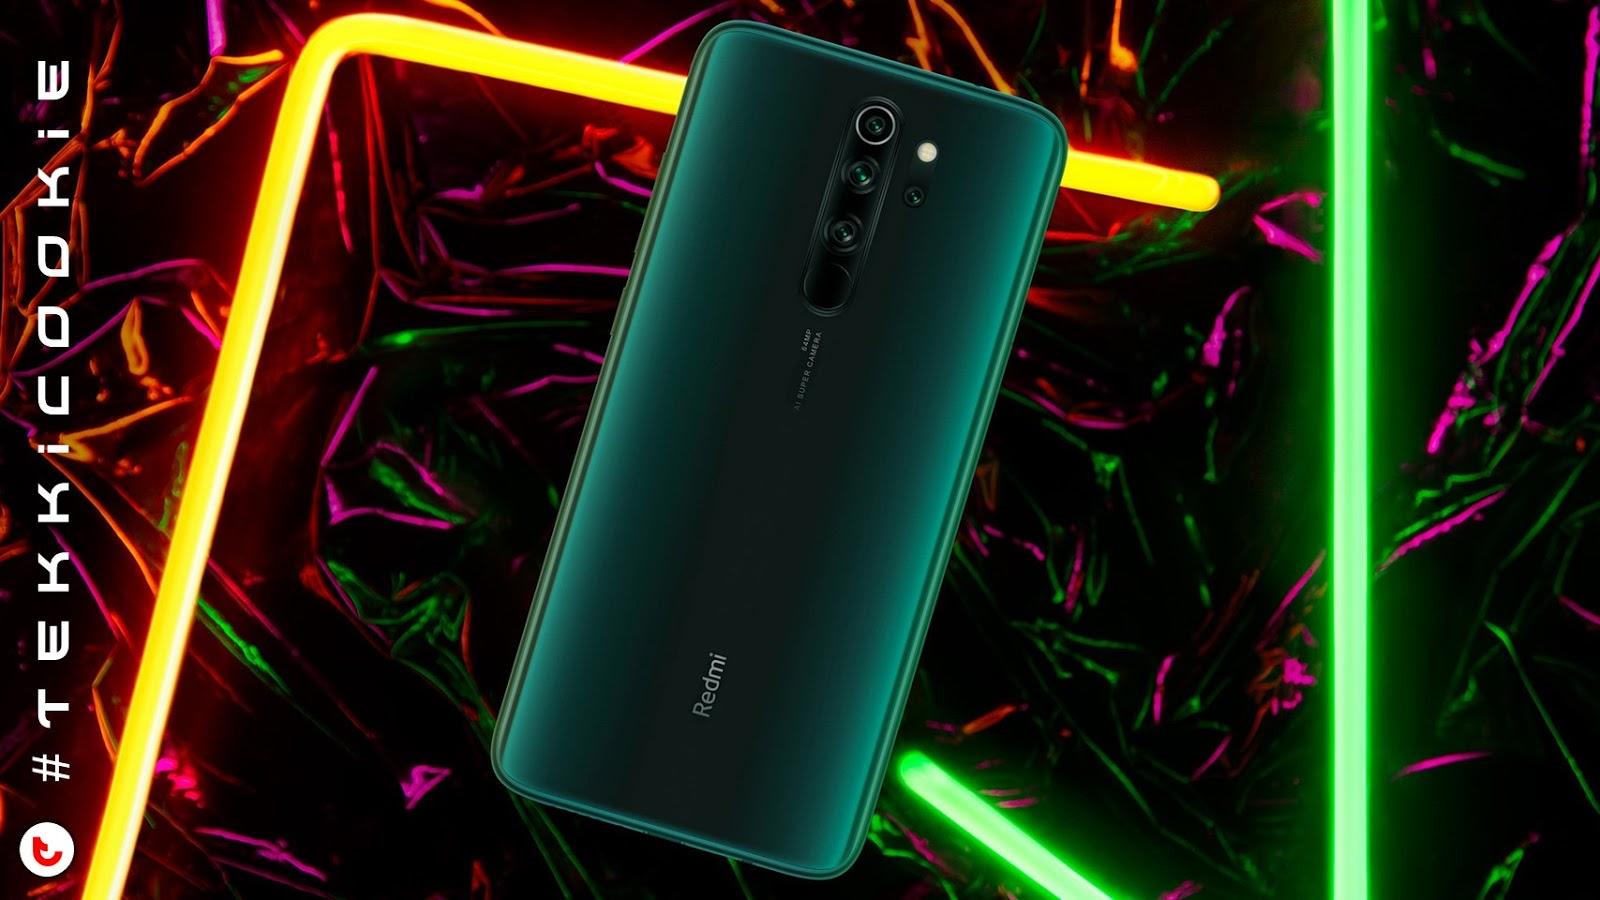 Redmi Note 8 Pro in Gamma Green